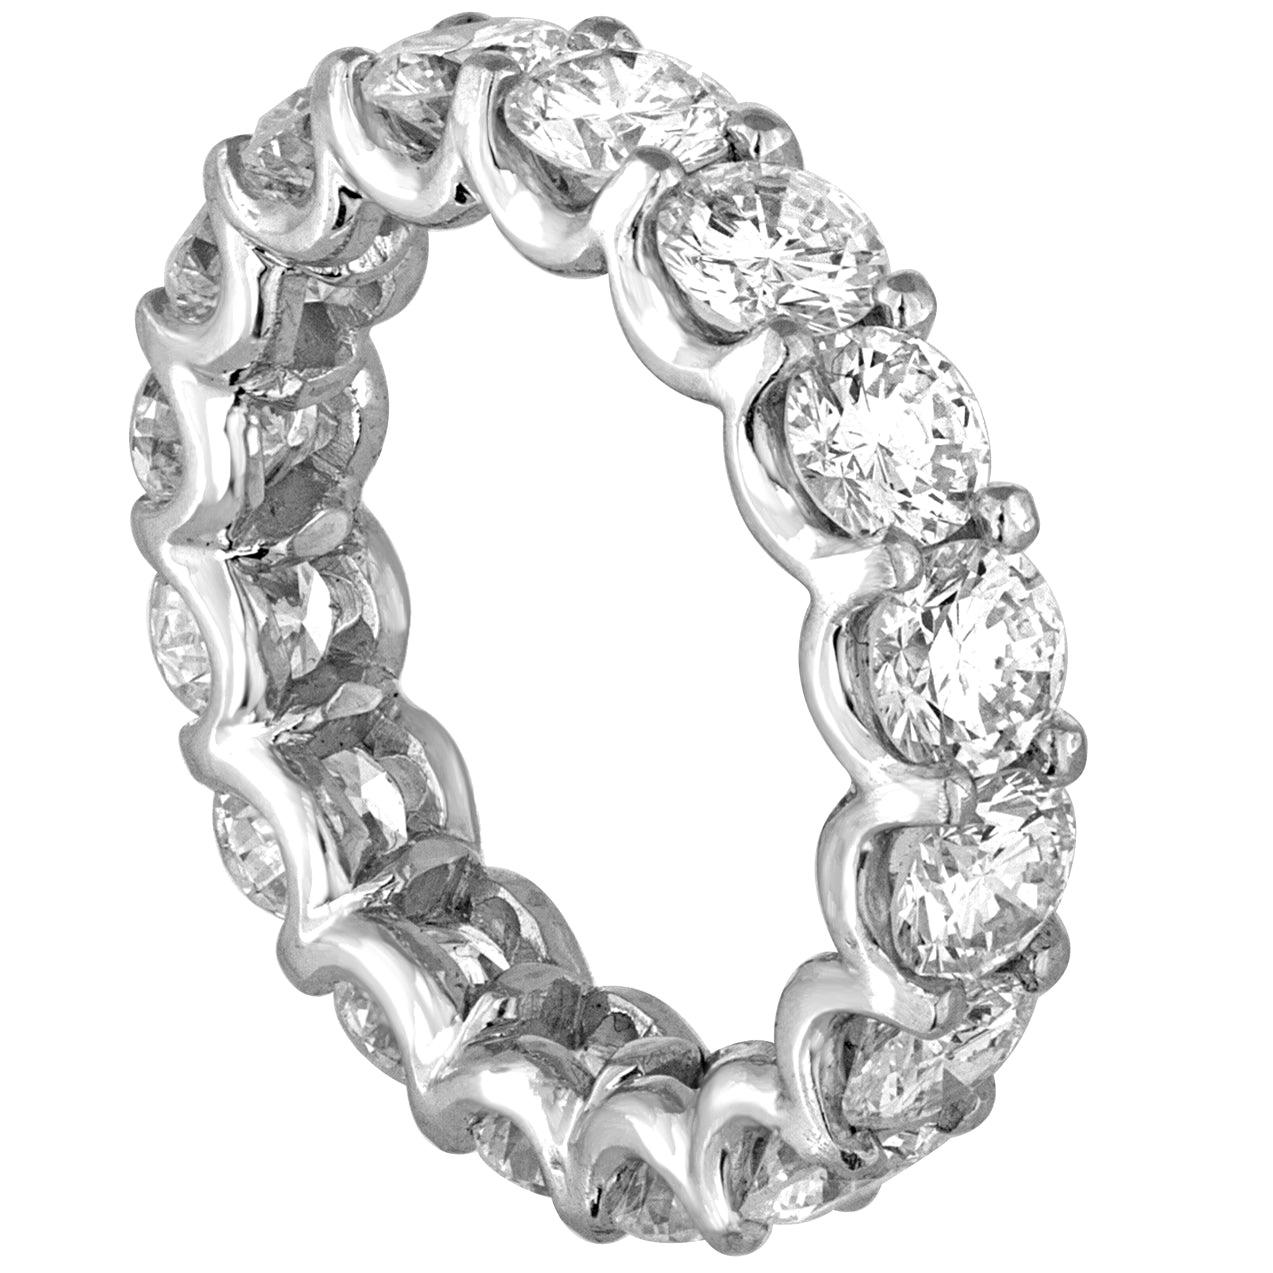 4.25 Carat Round Cut Diamond Platinum Eternity Band Ring